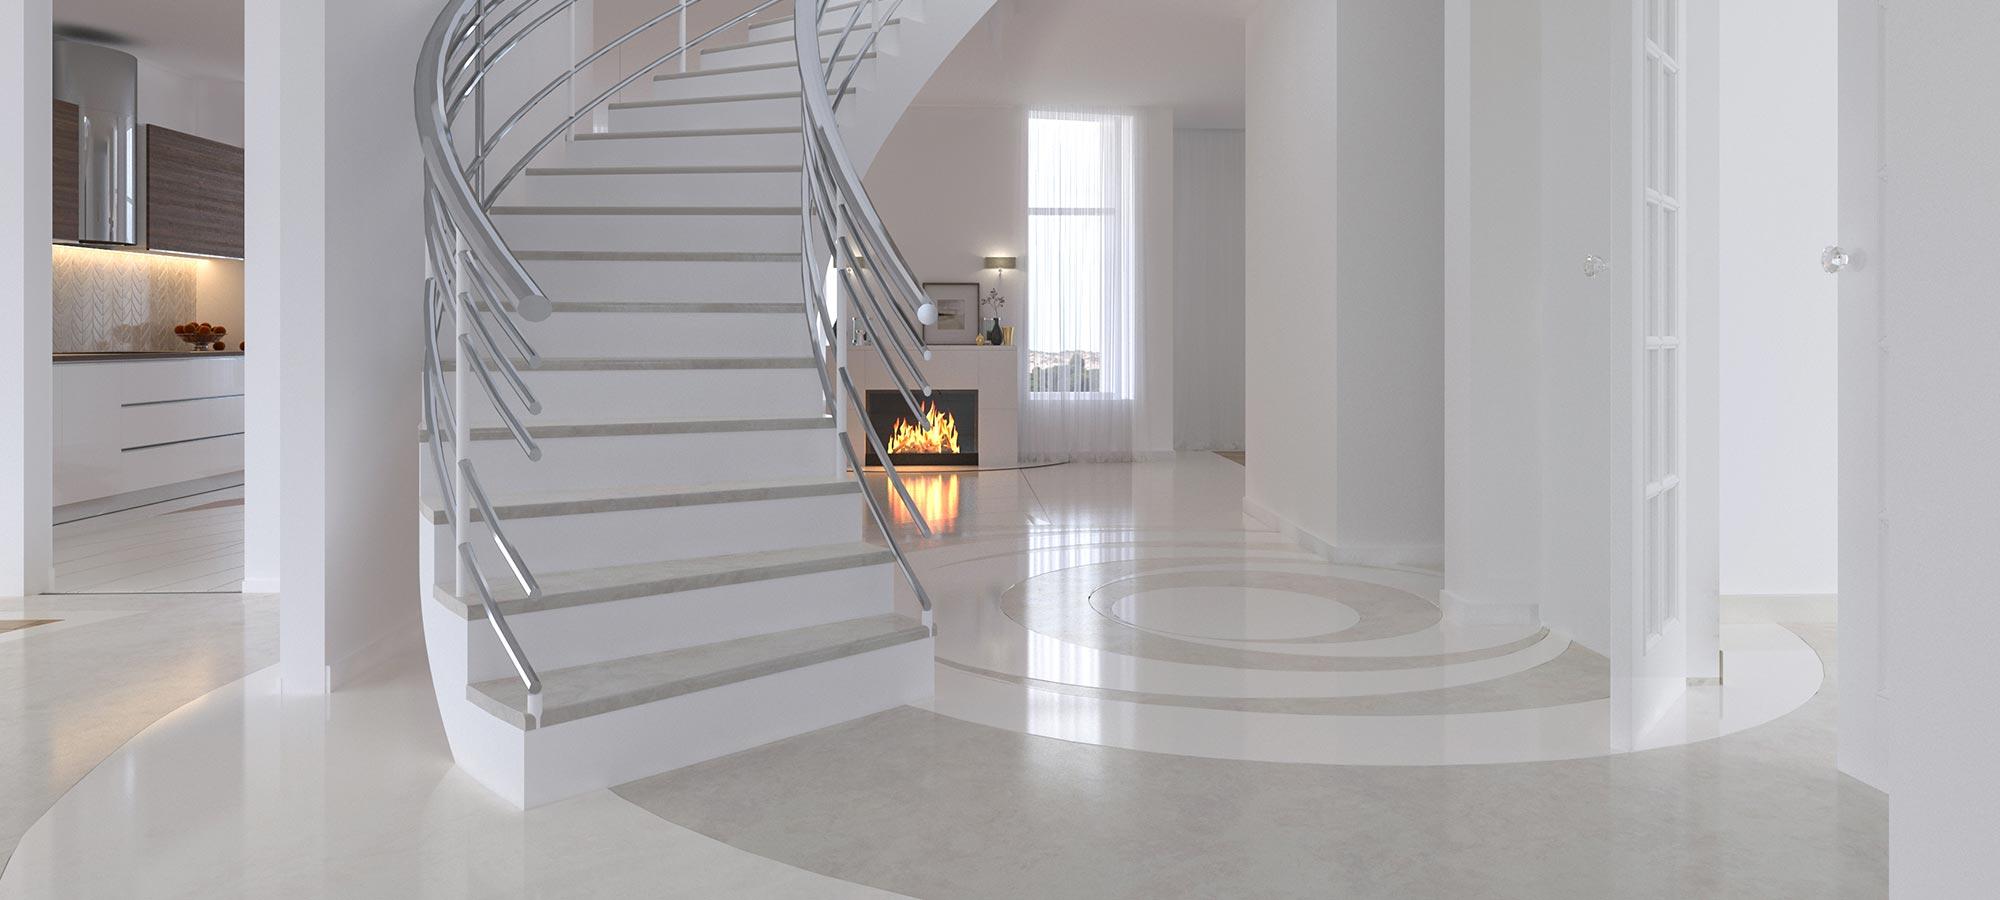 best modern floors pinterest ideas mobile grey flooring regarding on house